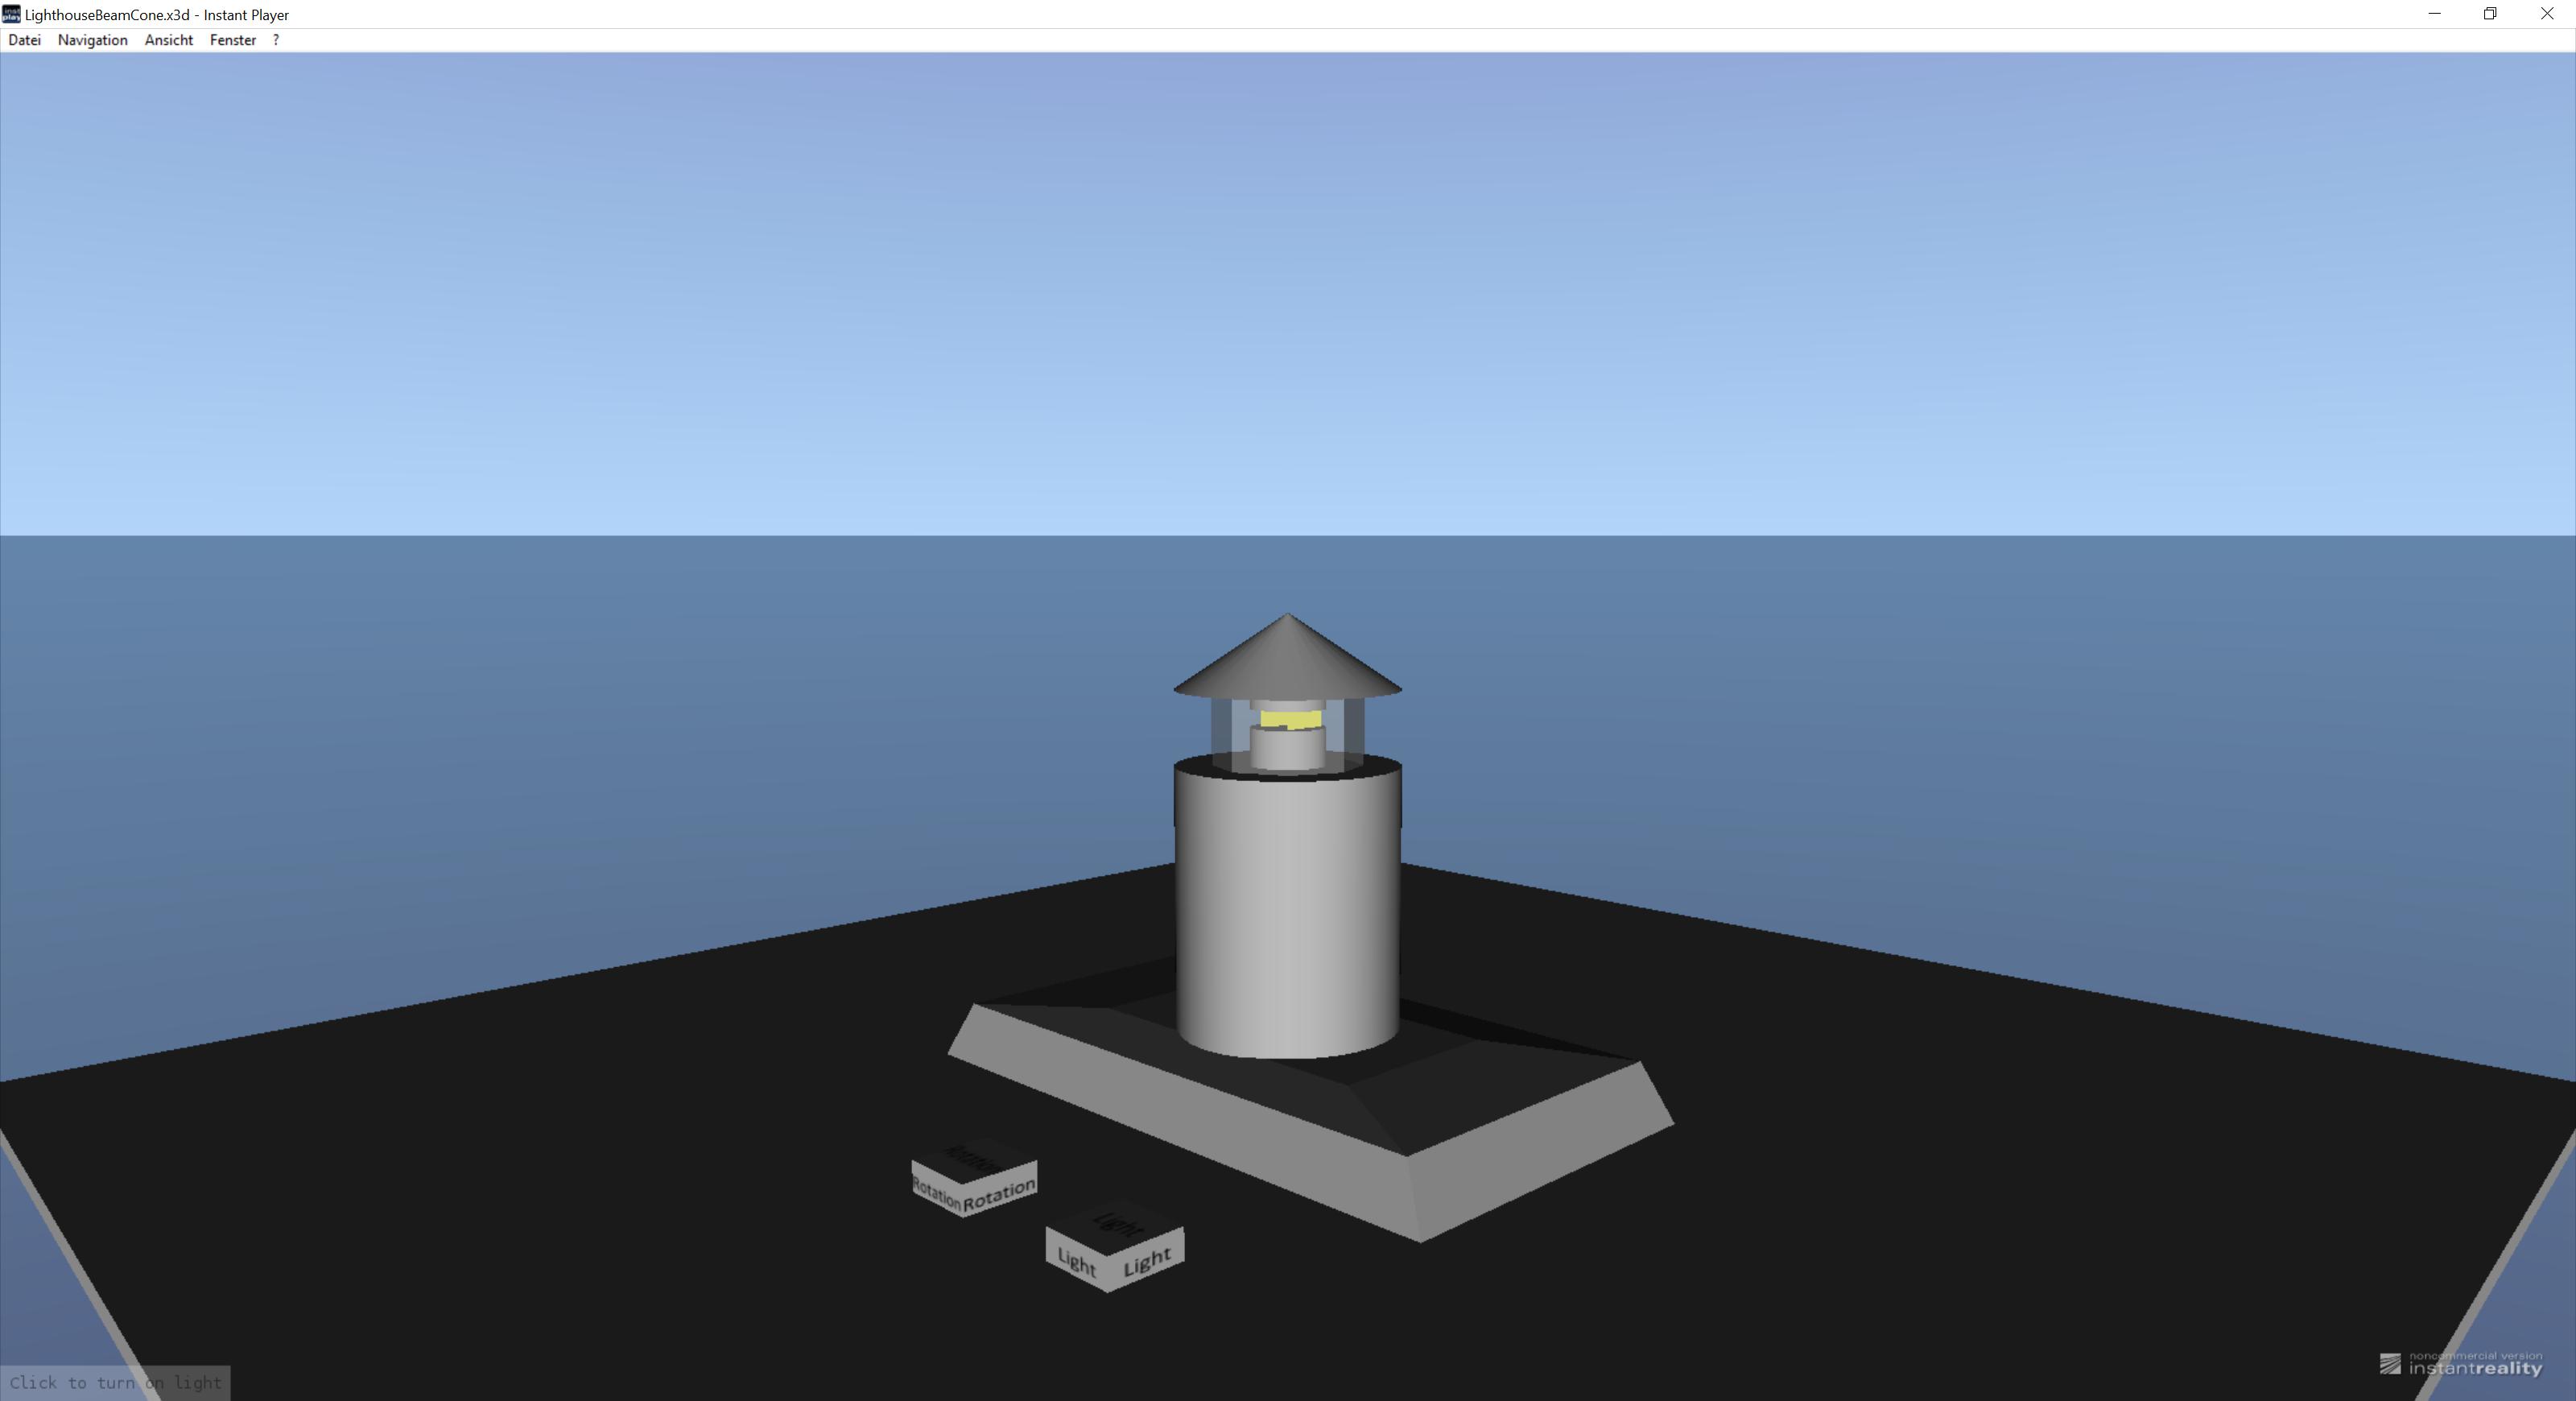 BrennenstuhlTobias/Screenshots/Player/Lighthouse/LightHouse.Instant3D.png